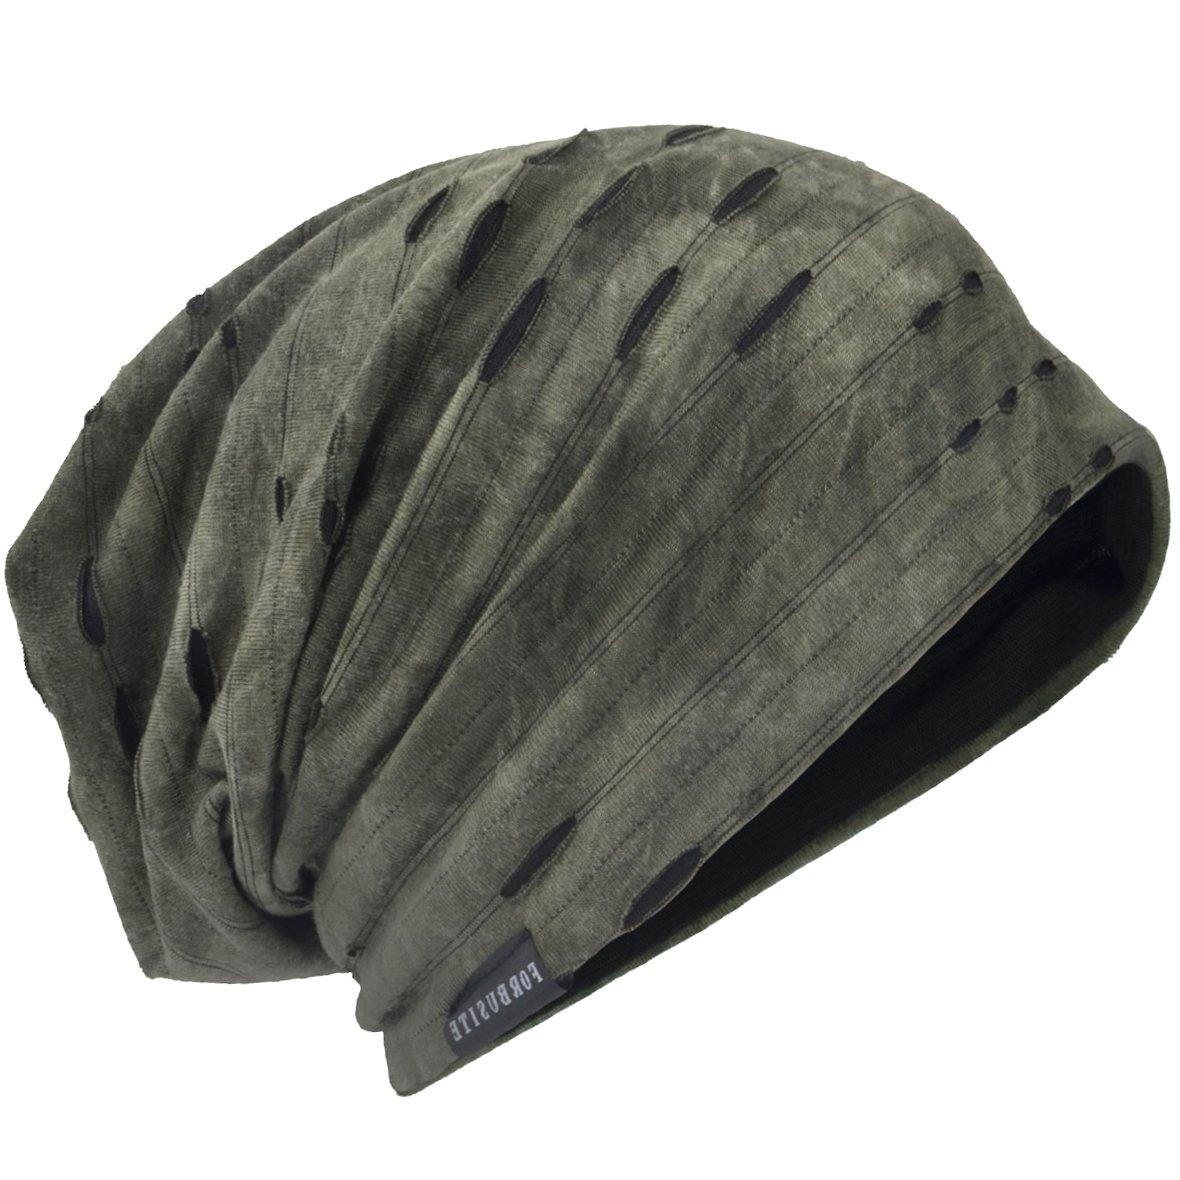 Mens Slouch Hollow Beanie Summer Skullcap B090 (C-Green, Thin Cool)